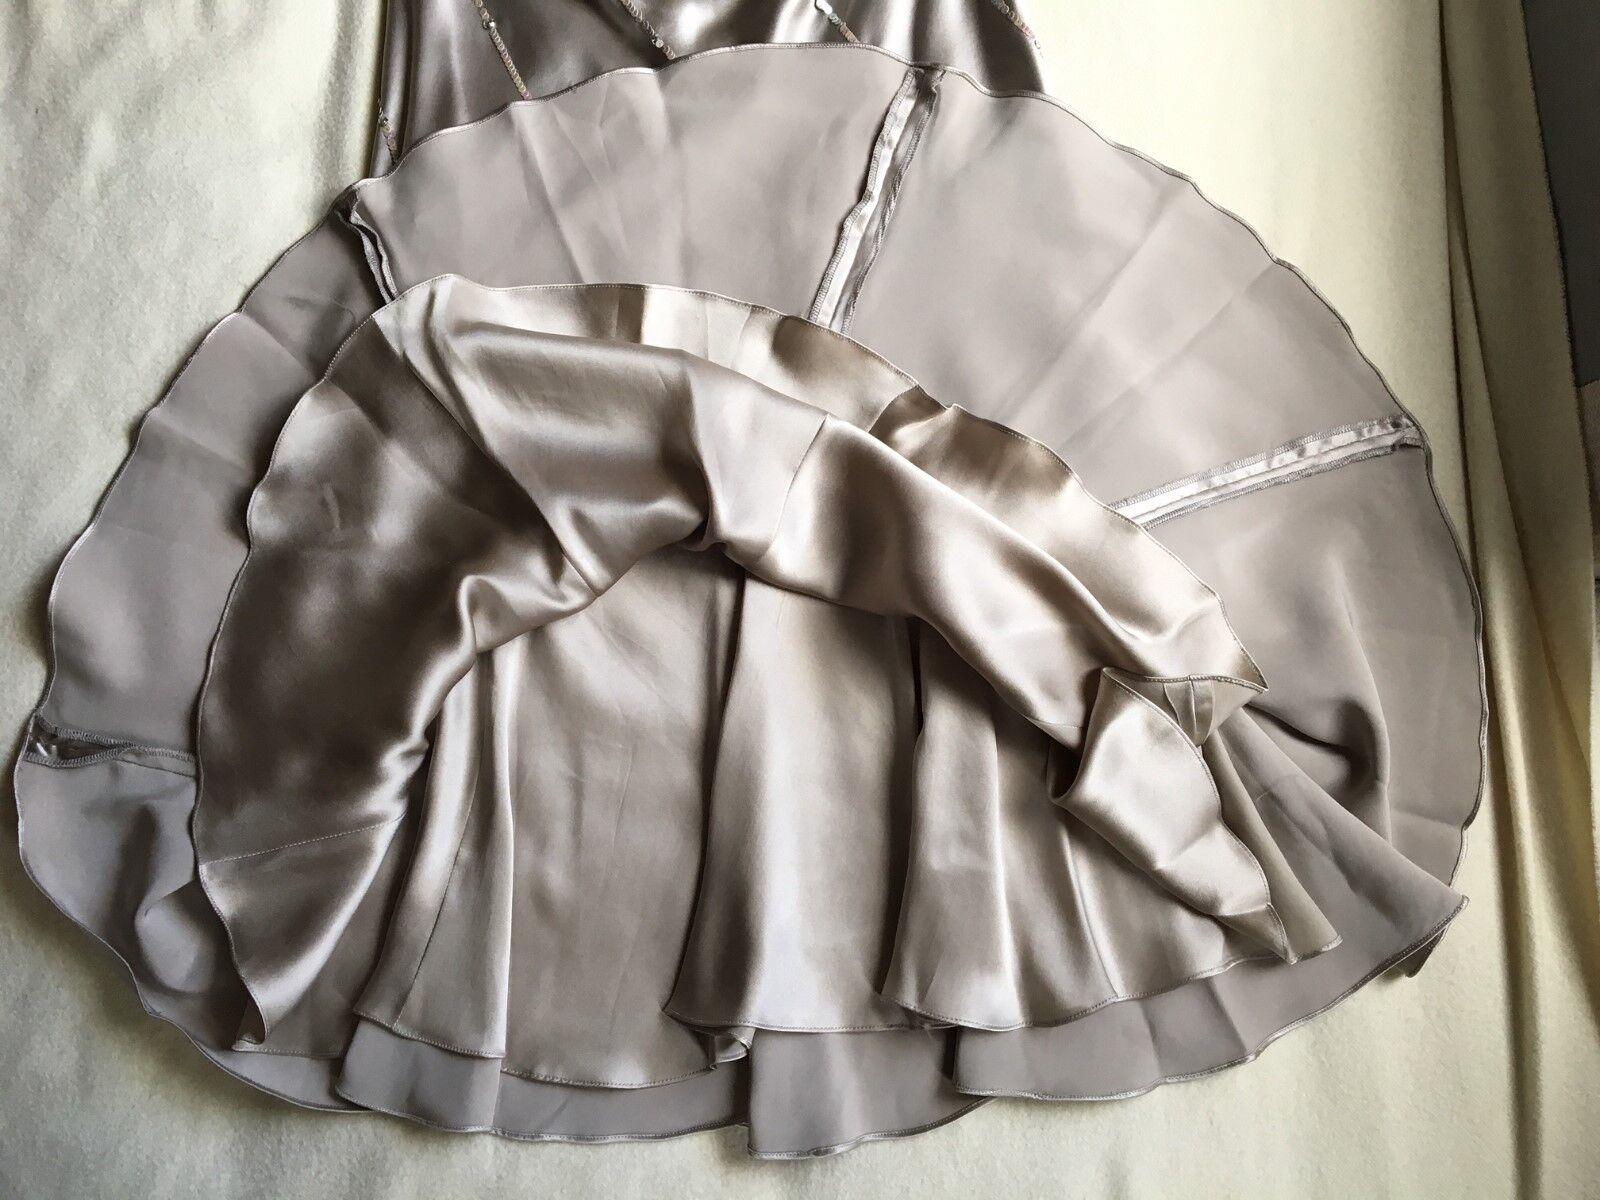 JENNY JENNY JENNY Packham taupe colore sbieco gonna in raso di seta con paillettes & Cristalli 9efee3